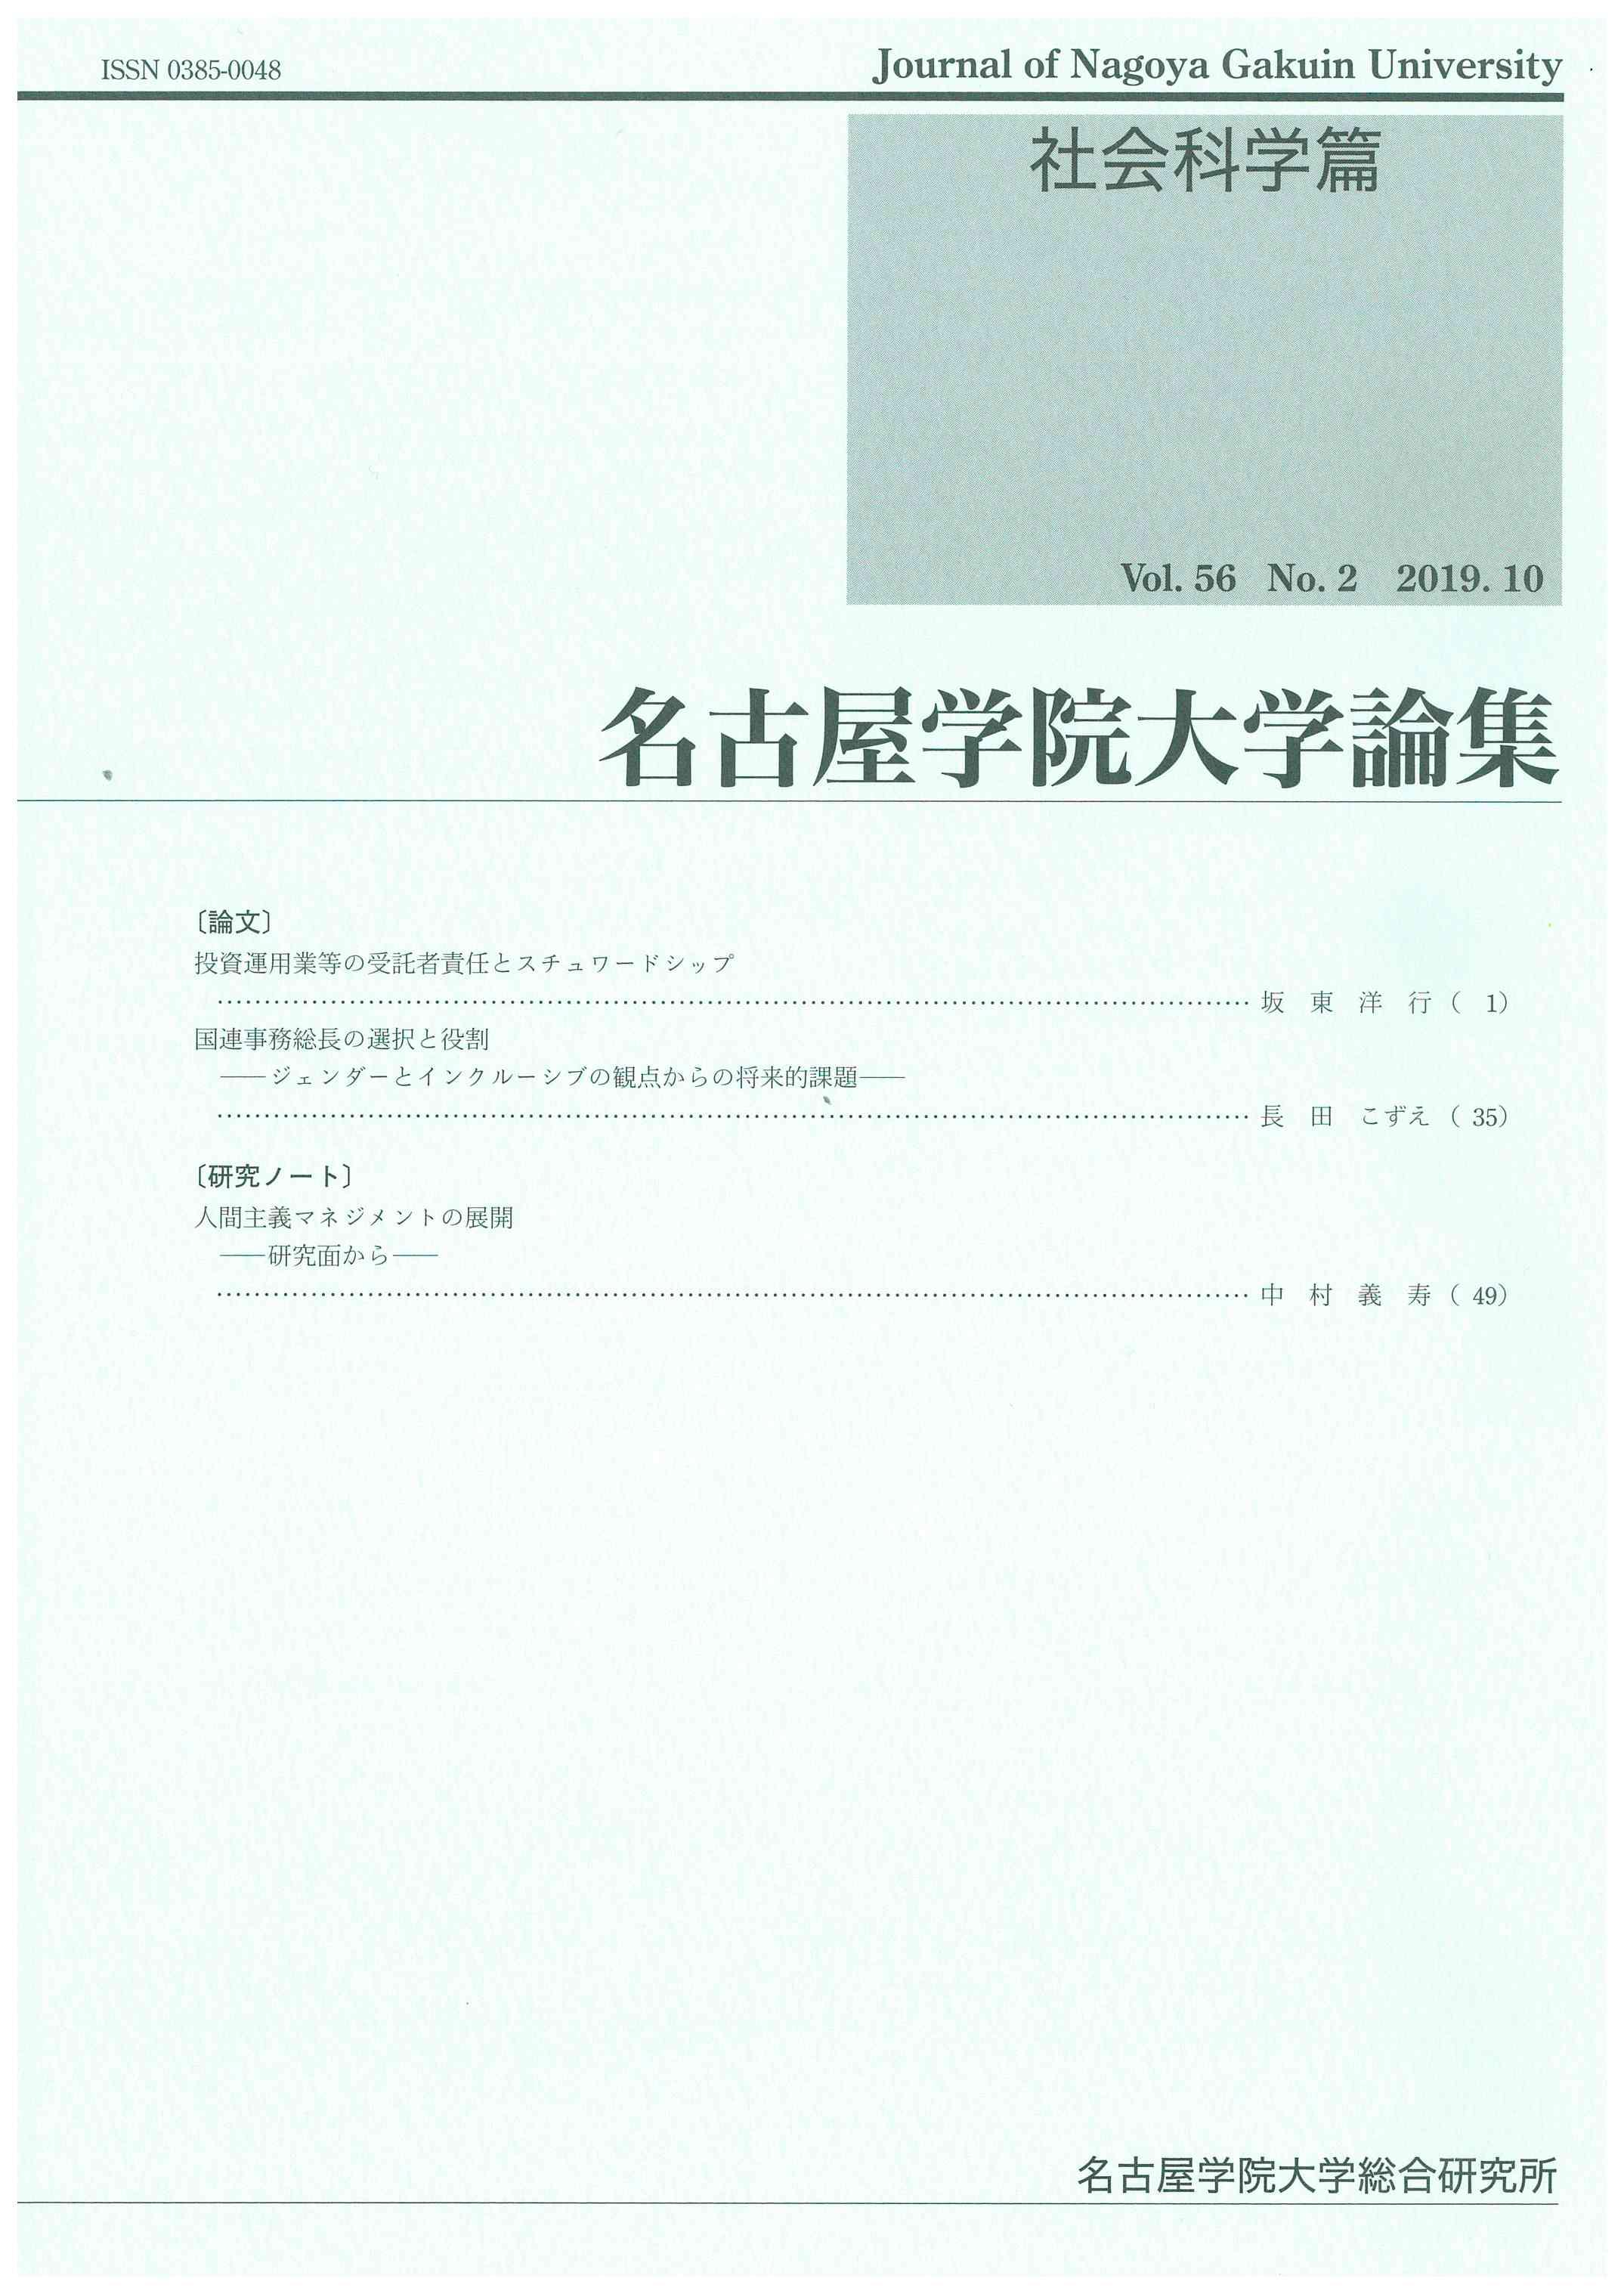 shakai56-2.jpg